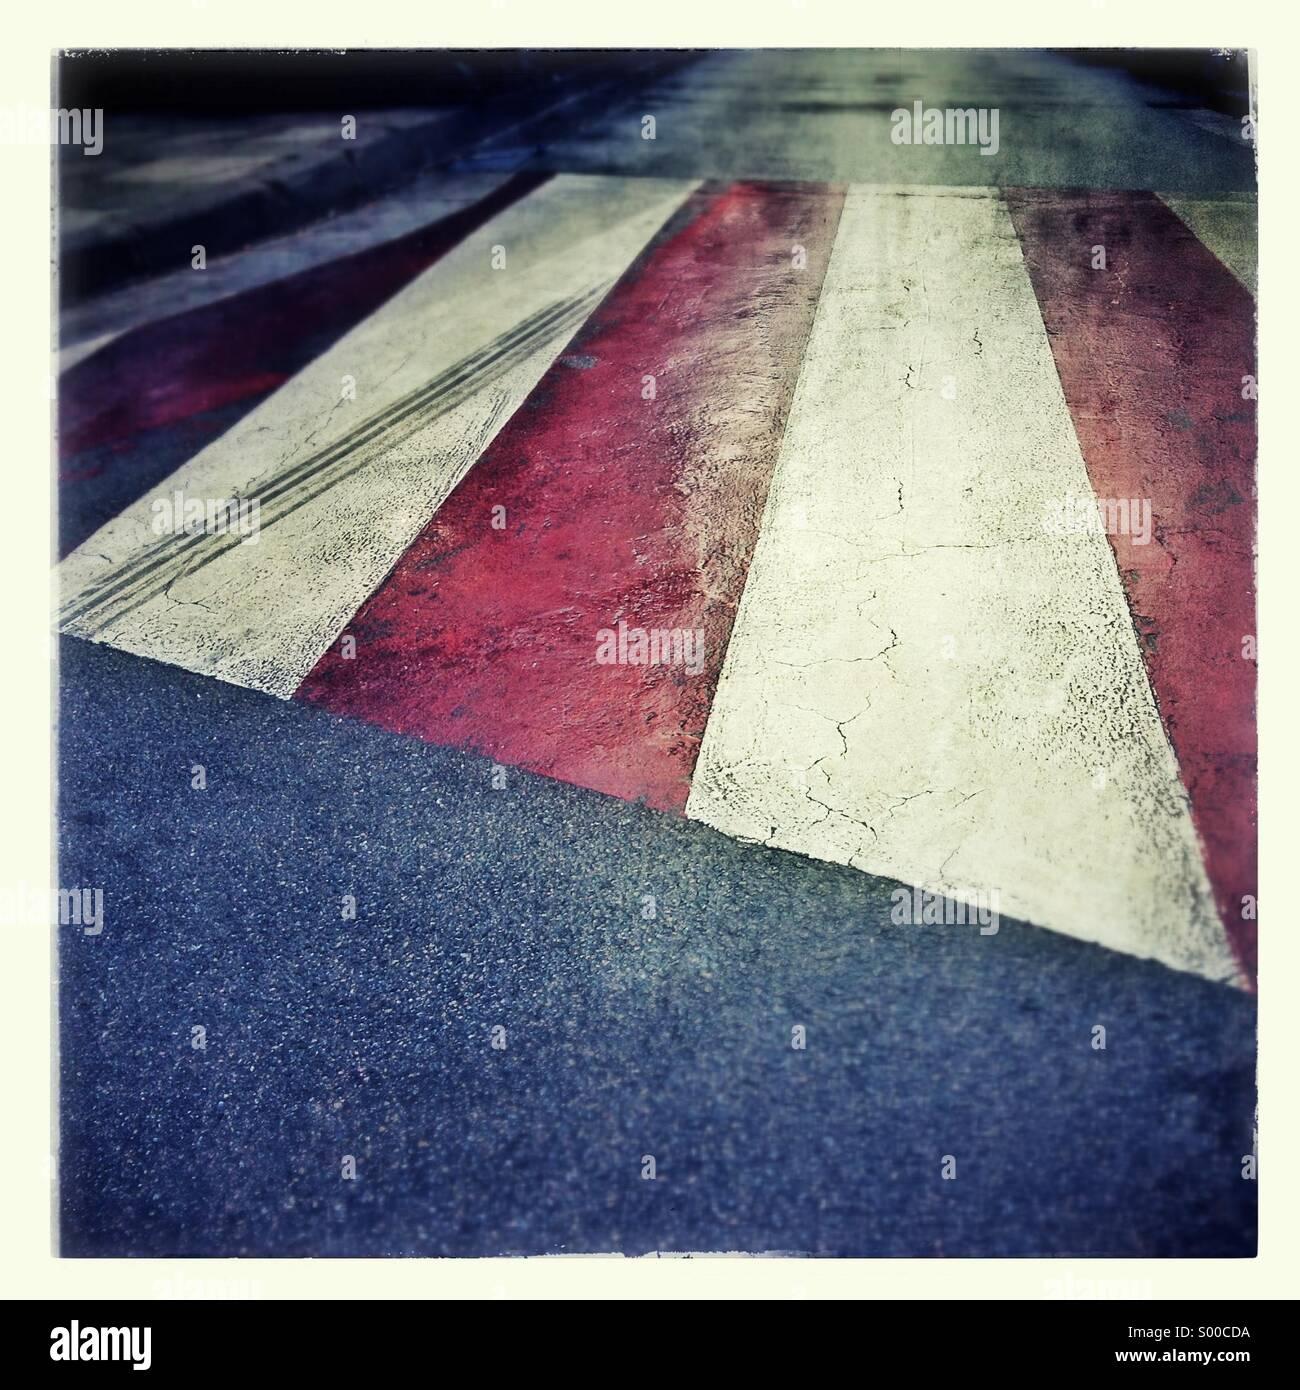 Pedestrian crossing, zebra crossing sidewalk - Stock Image